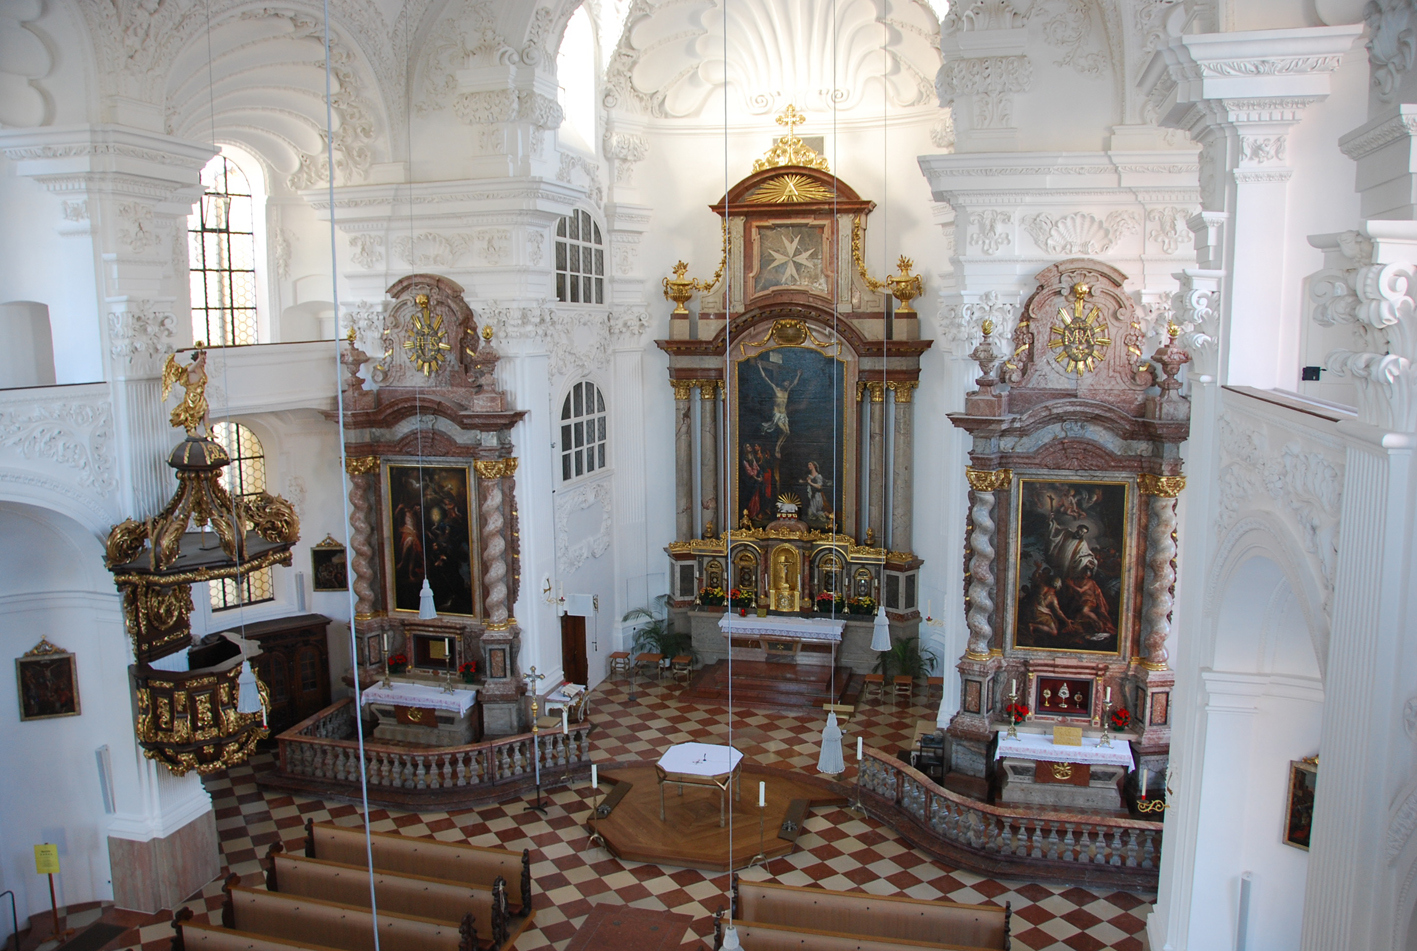 2020 08 12 aoelfb blick in die kirche stmagdalena altoetting